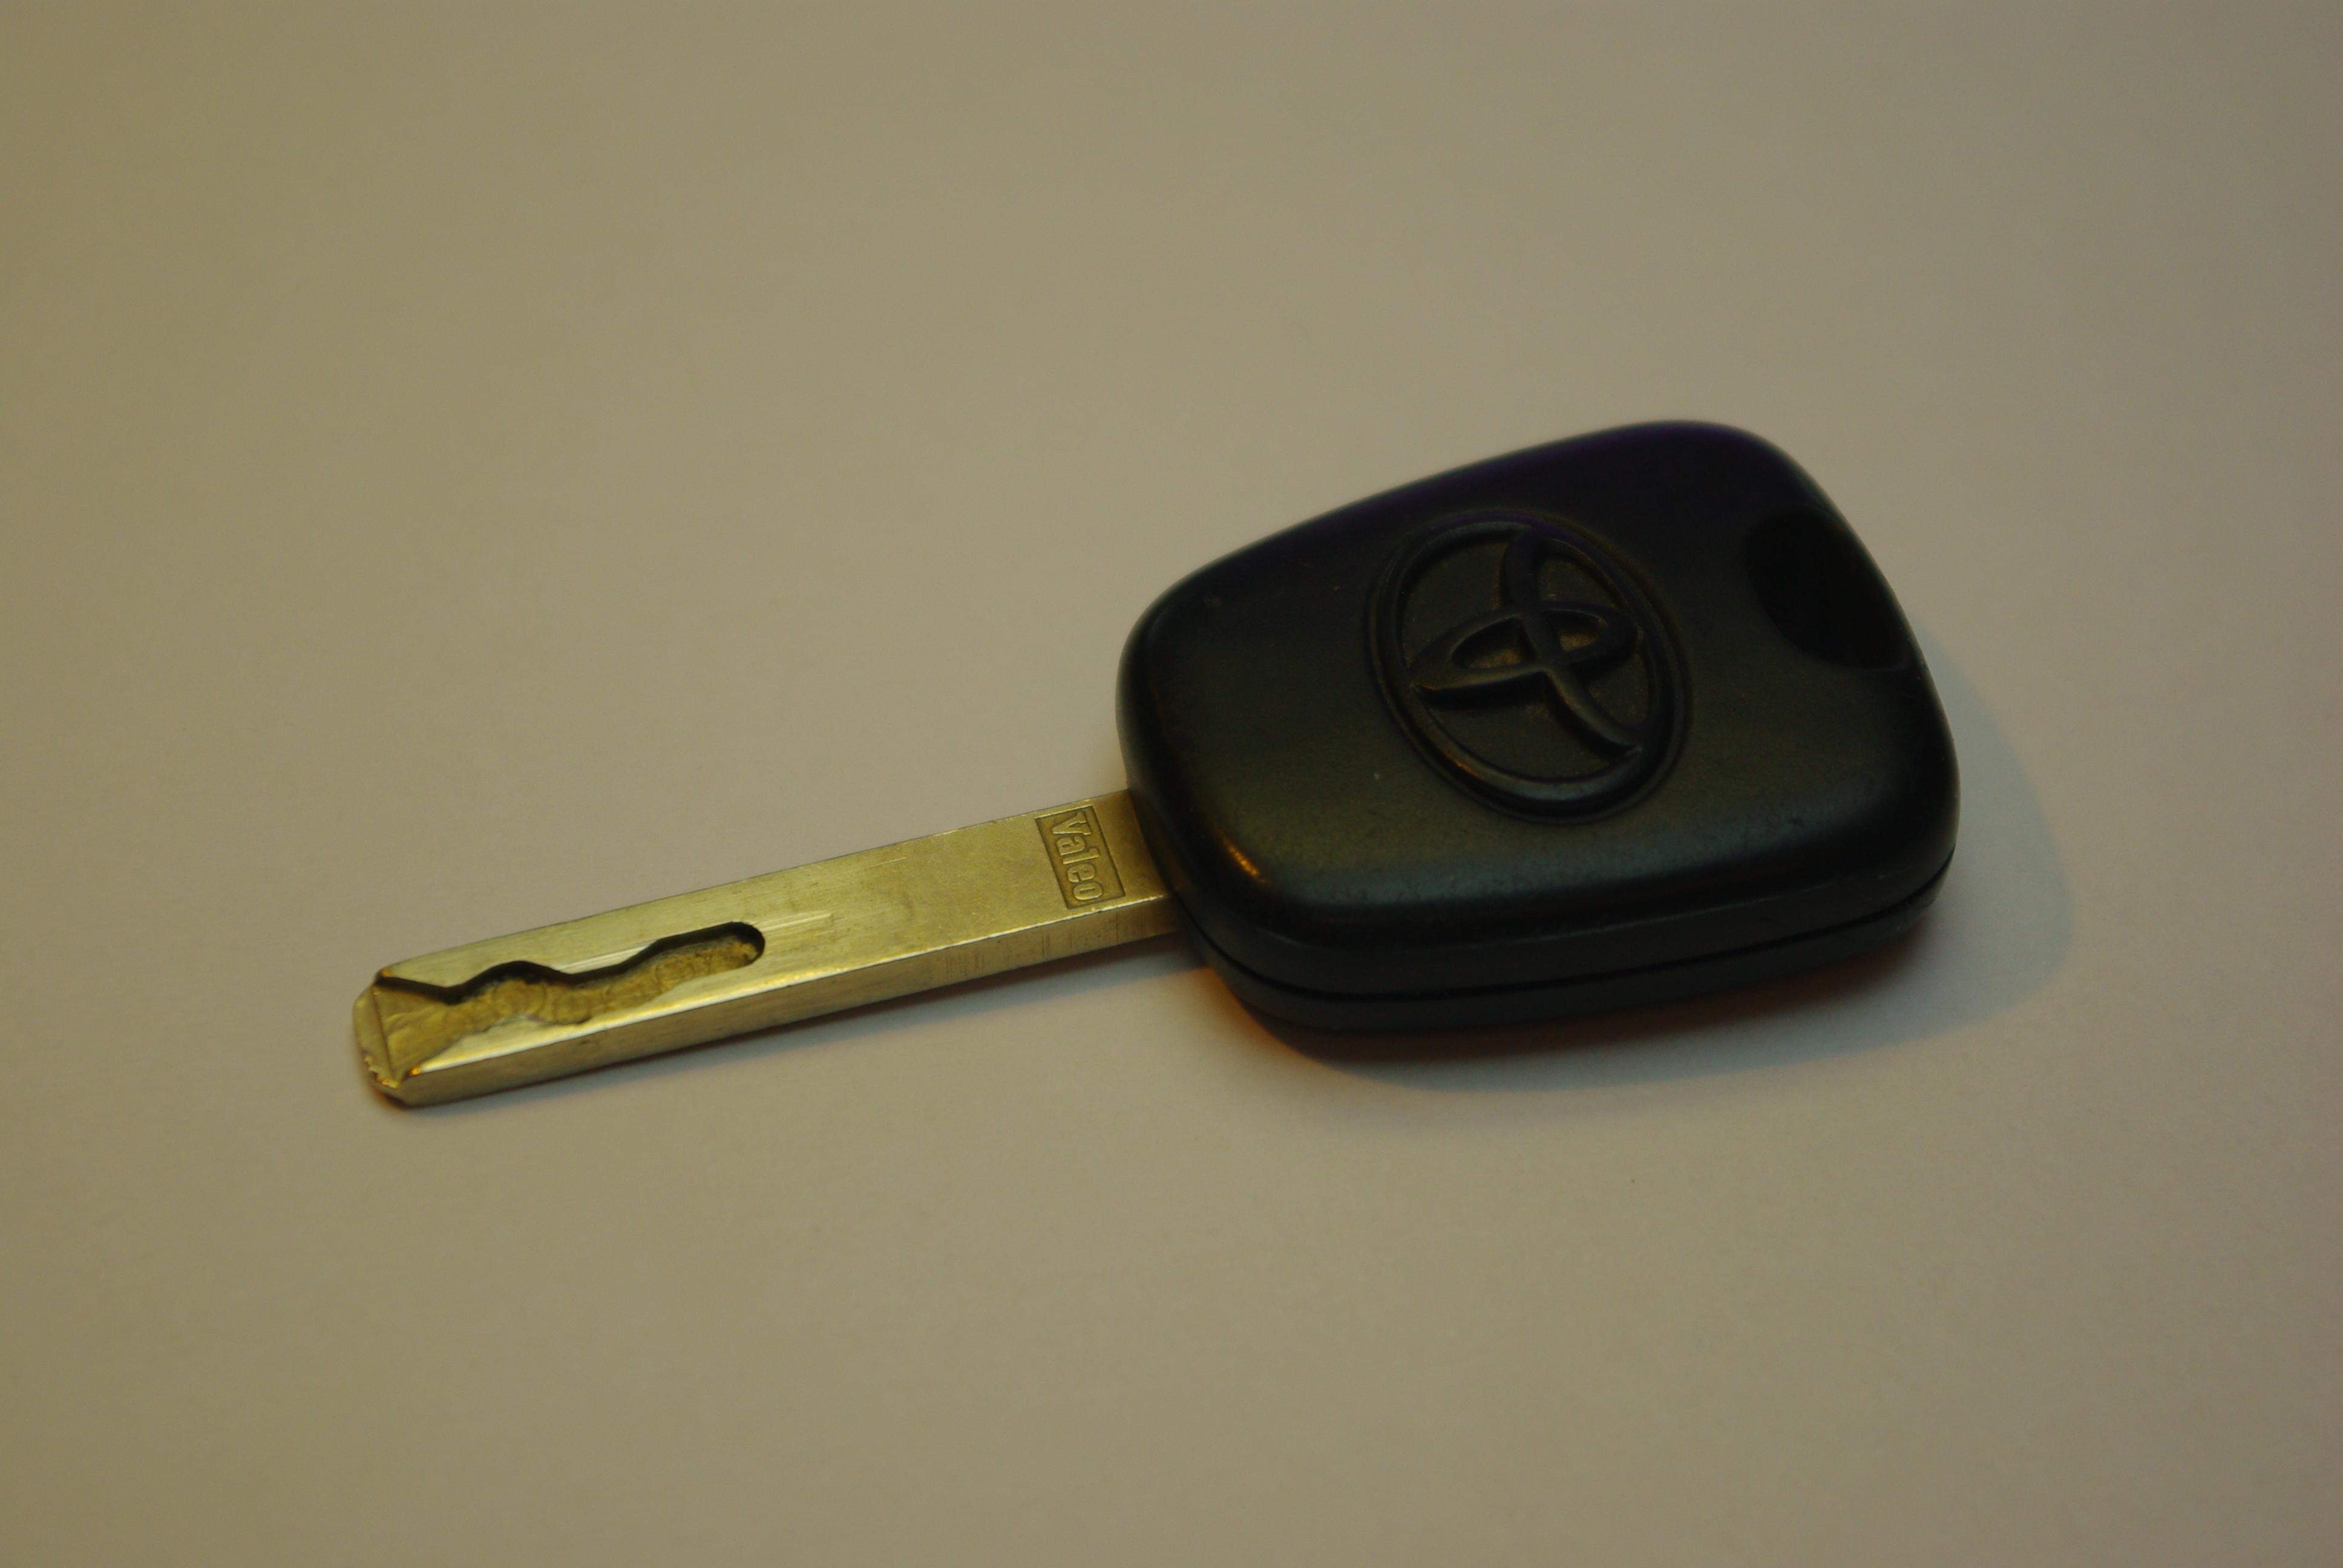 Toyota Aygo 1.0PB - Nie odpala k�opot z immobiliserem